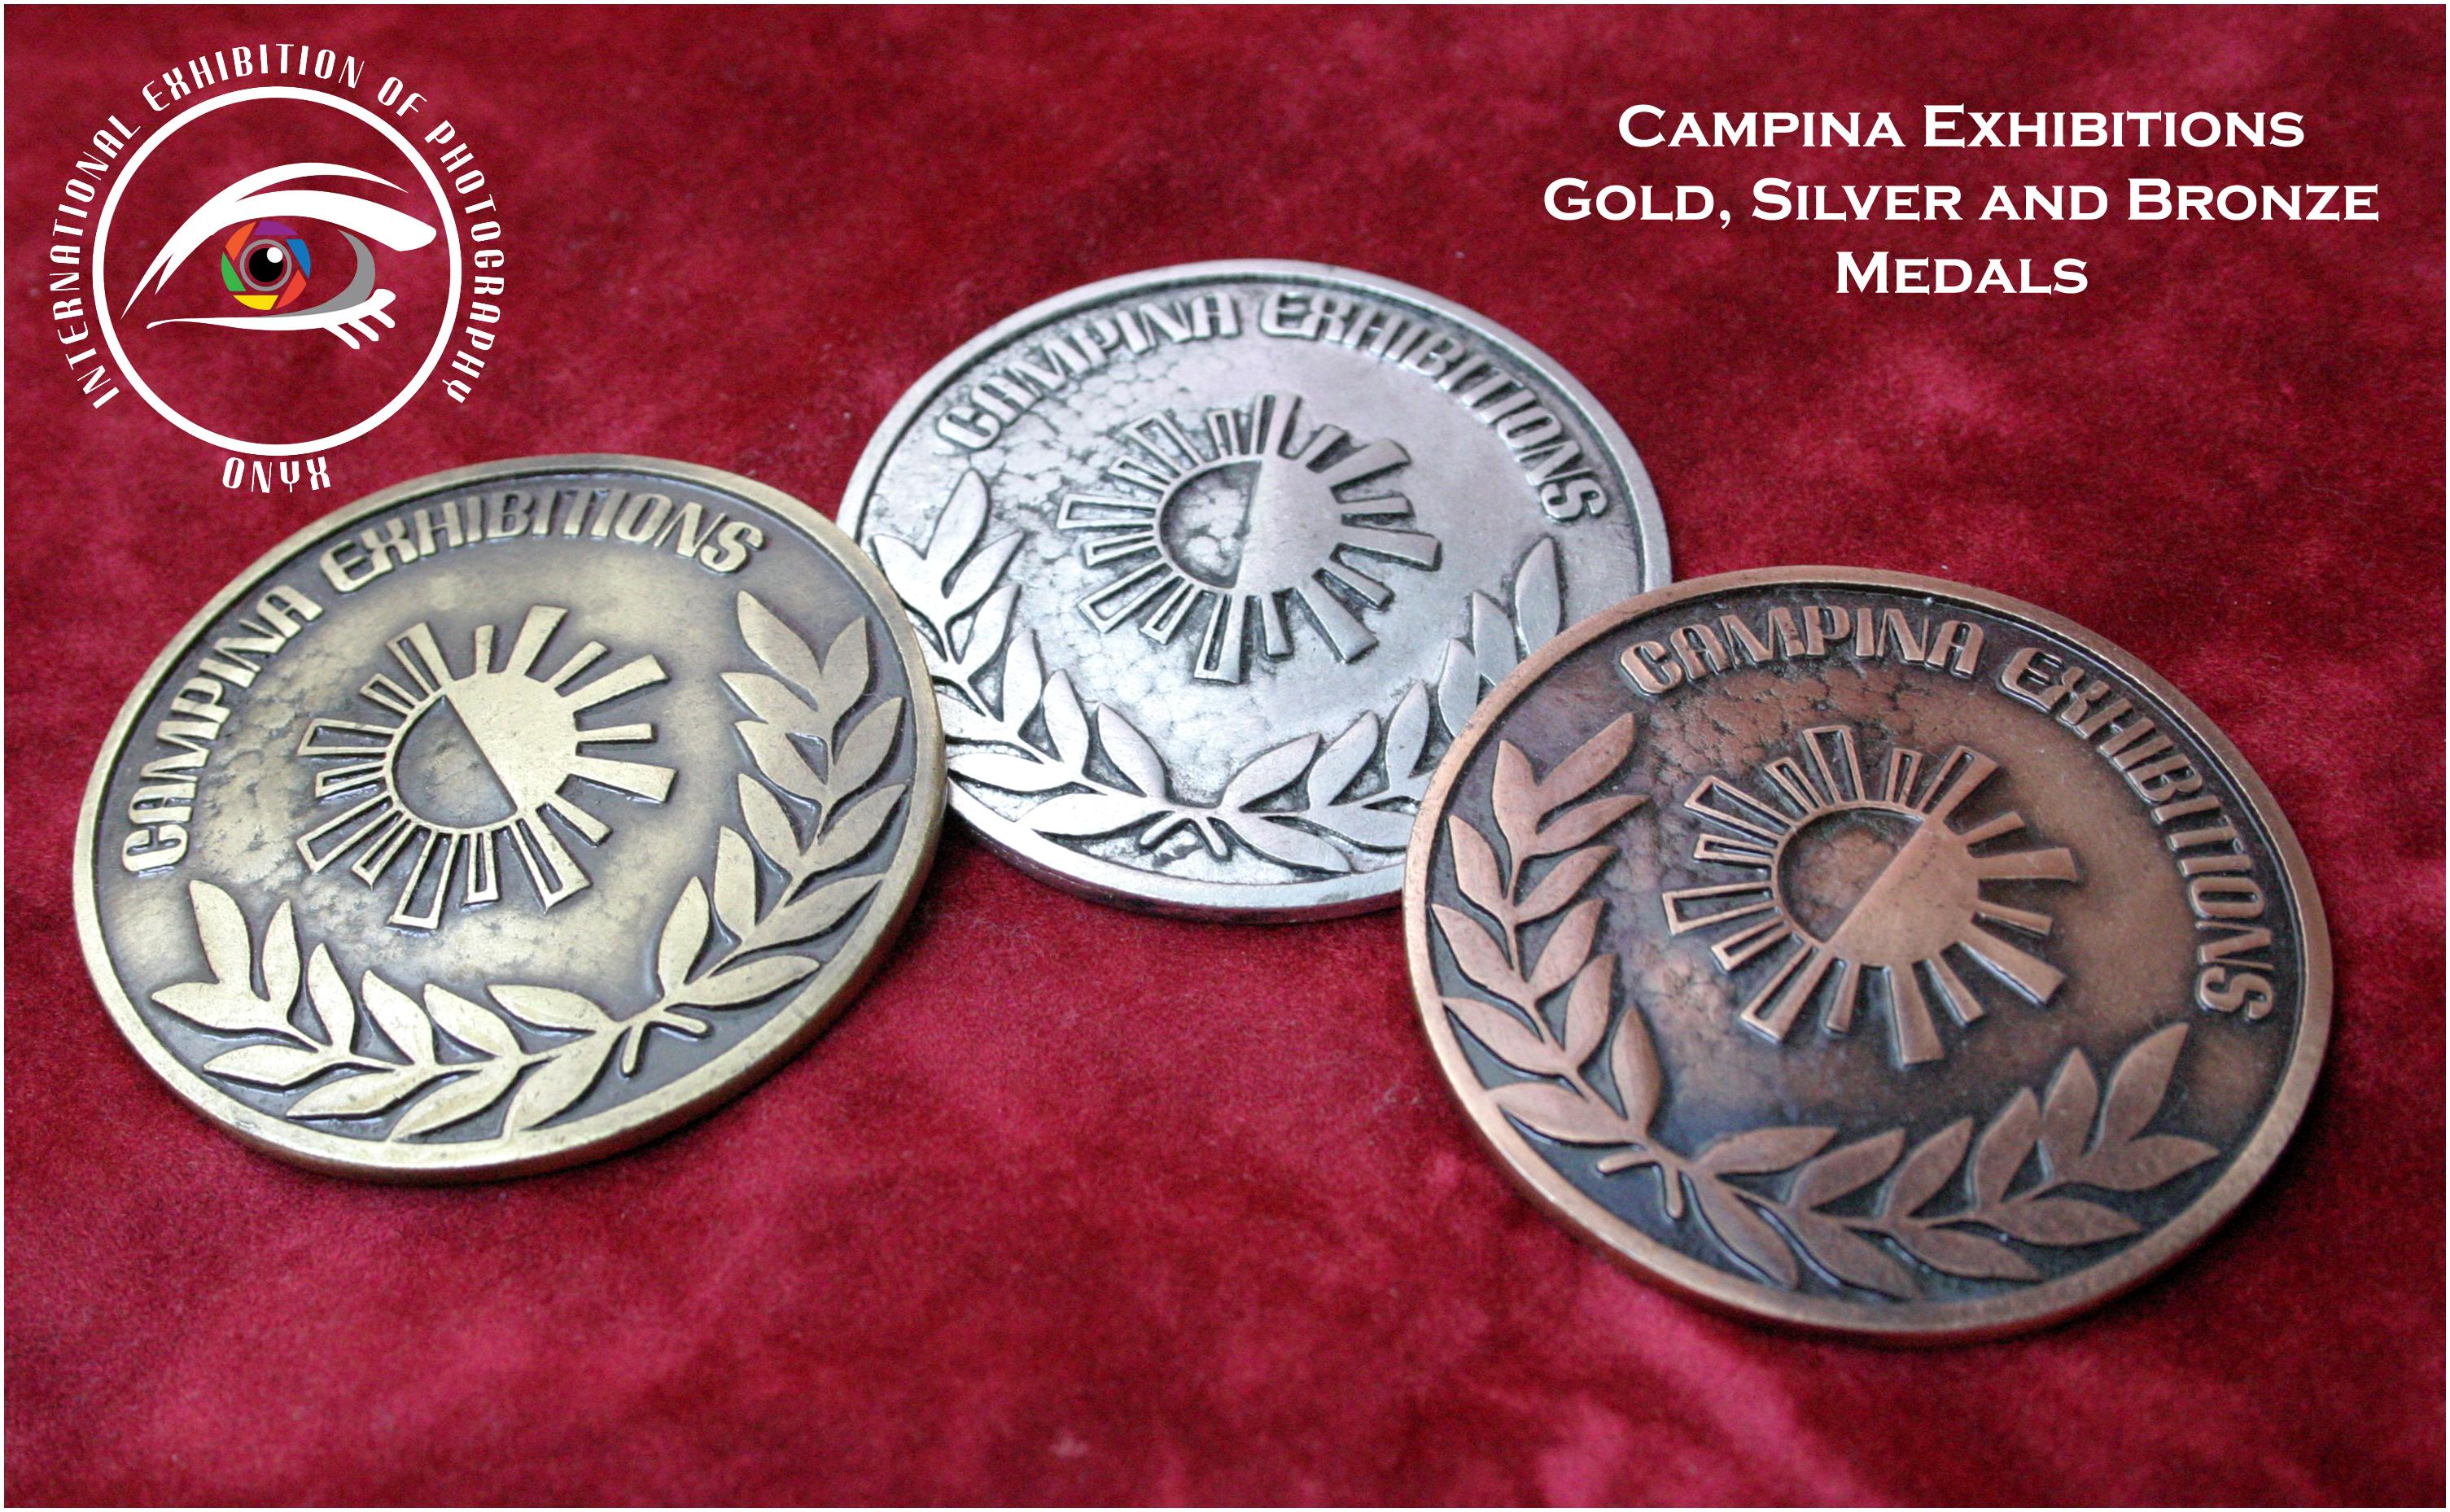 Campina Exhibitions